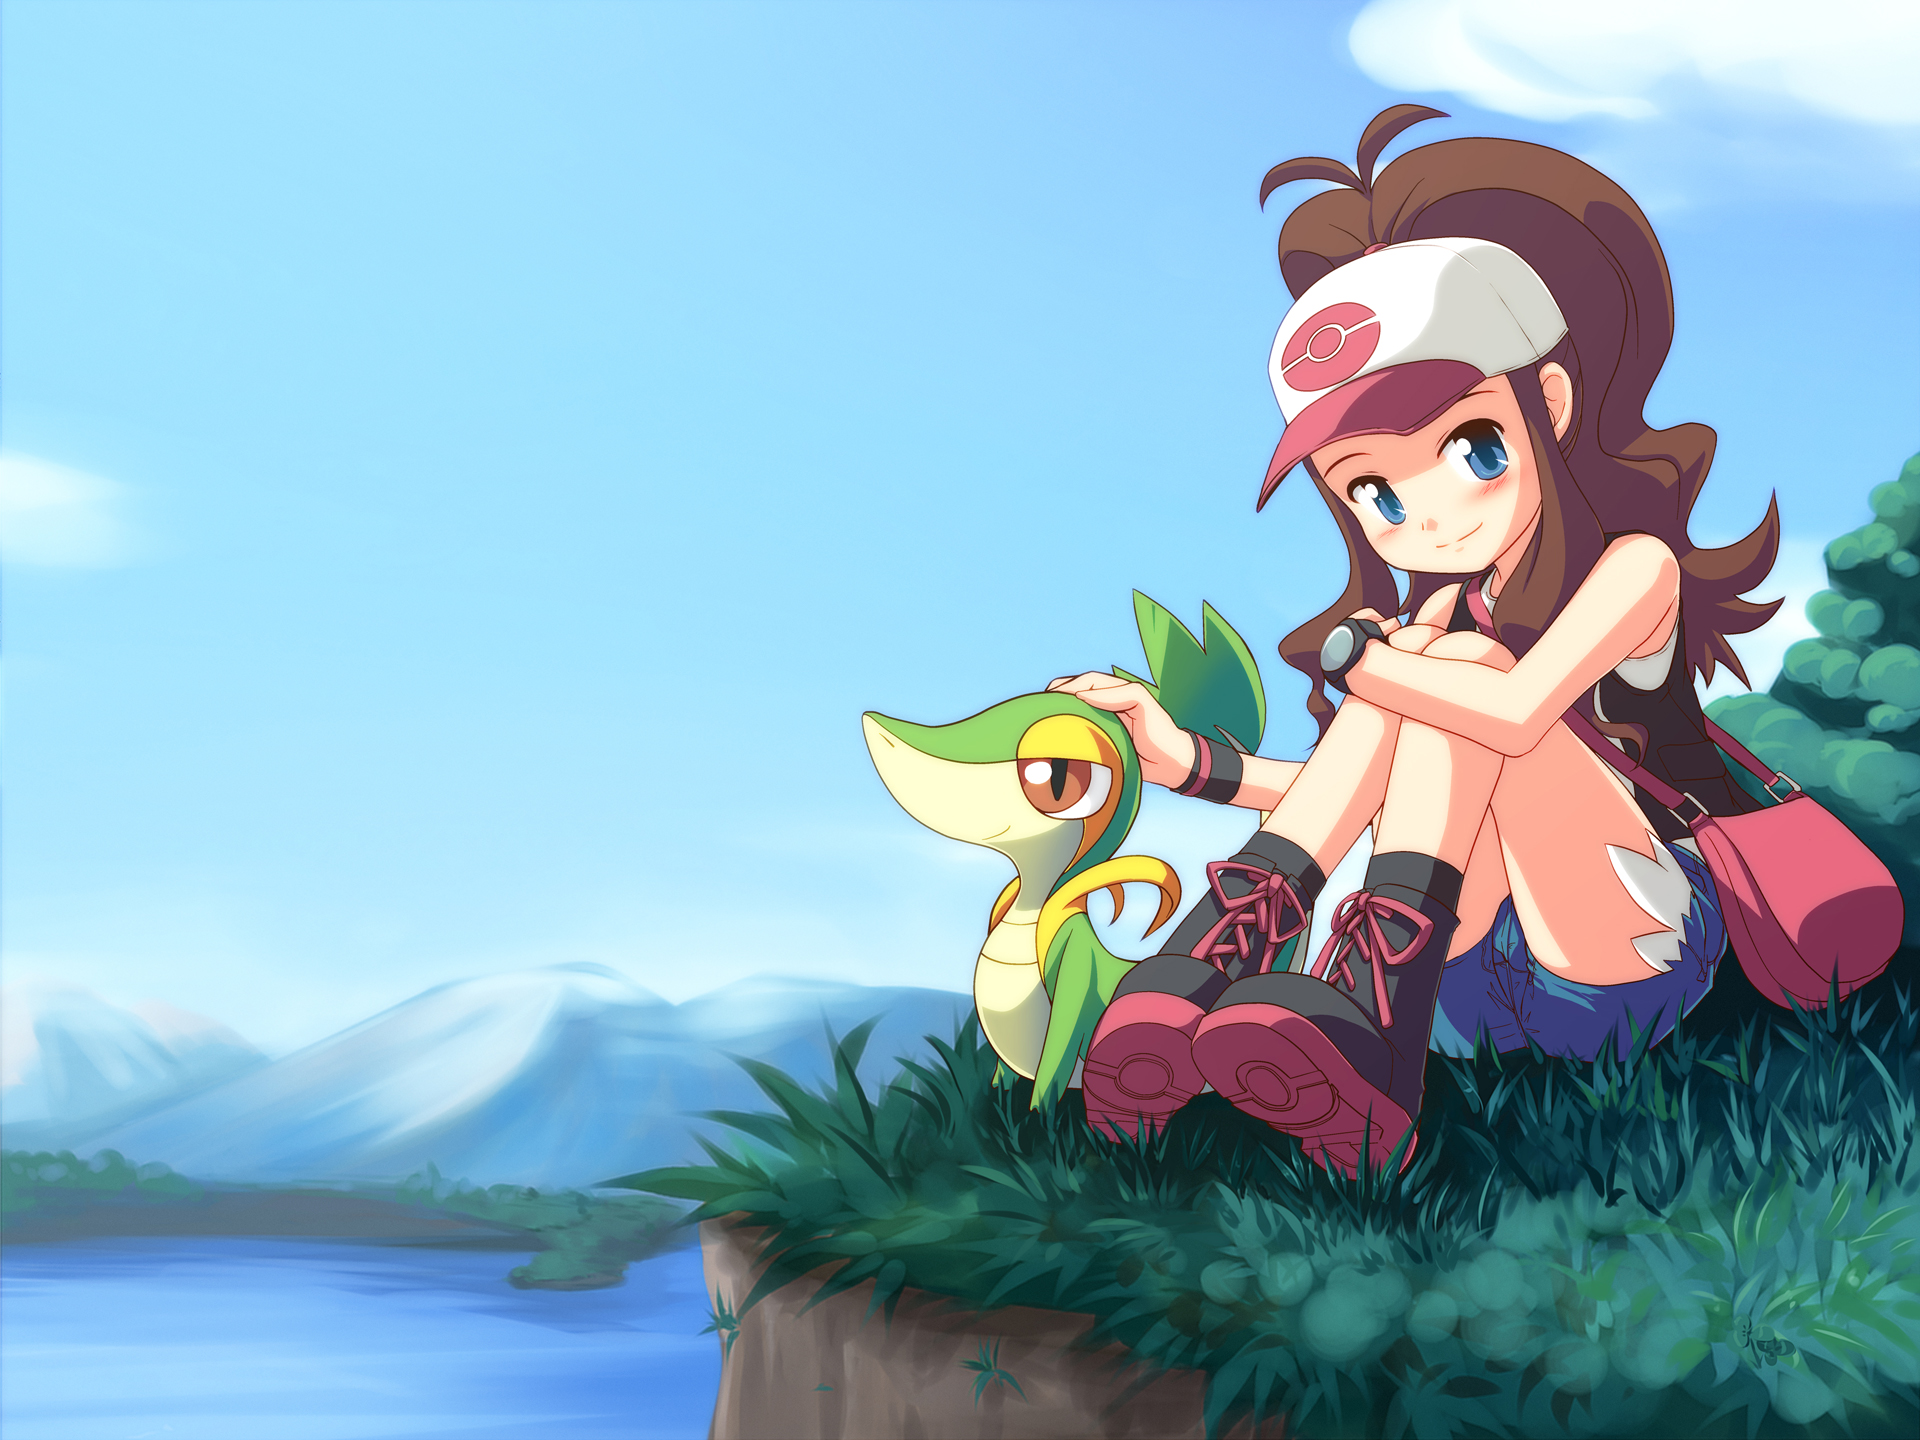 pokémon full hd wallpaper and background | 1920x1440 | id:240152